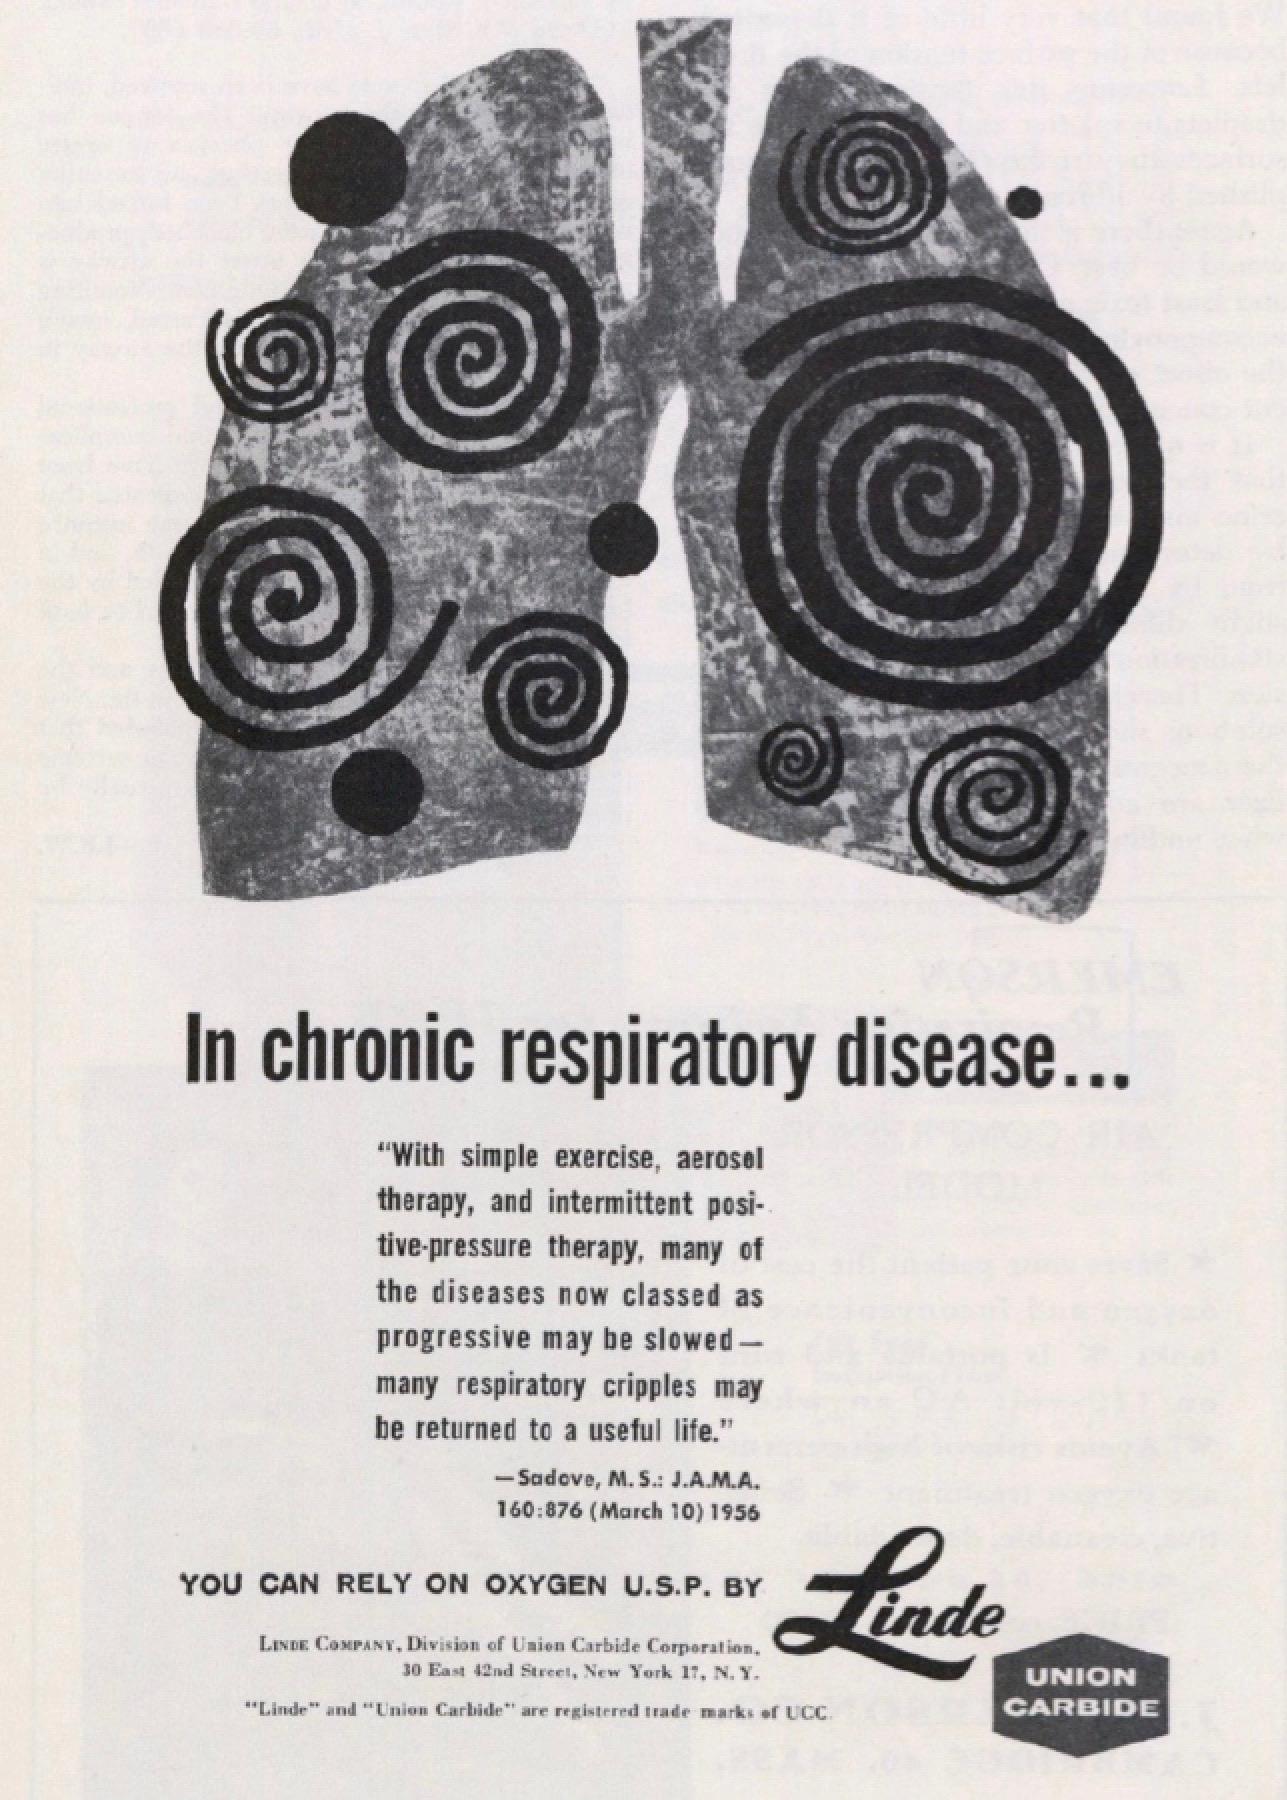 Linde Oxygen ad